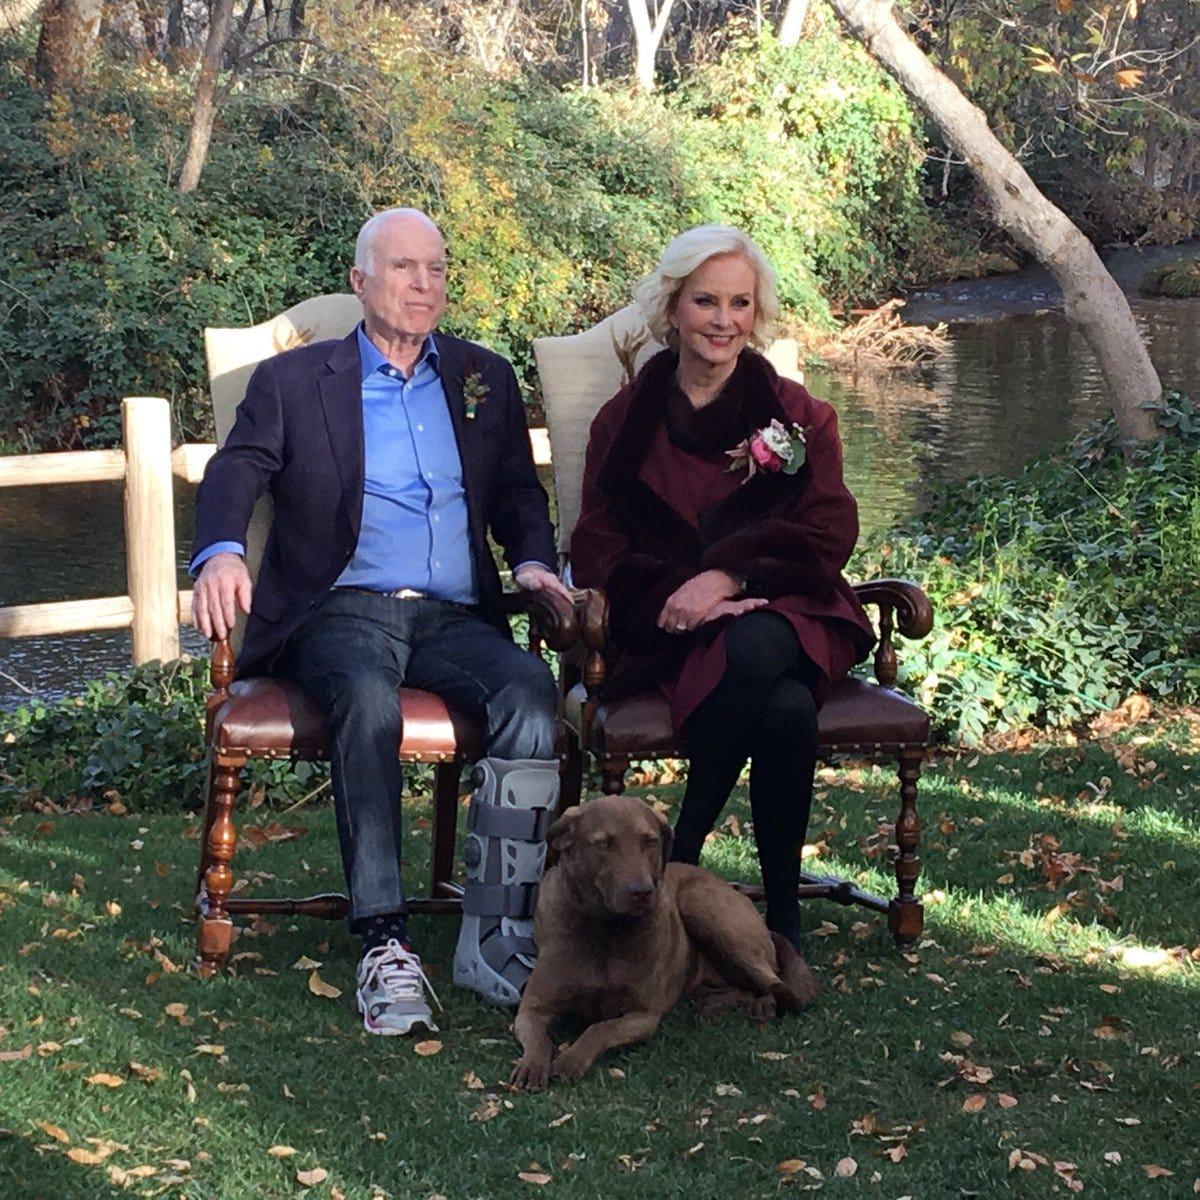 John McCain's beloved dog Burma dies in 'tragic accident,' Cindy McCain says